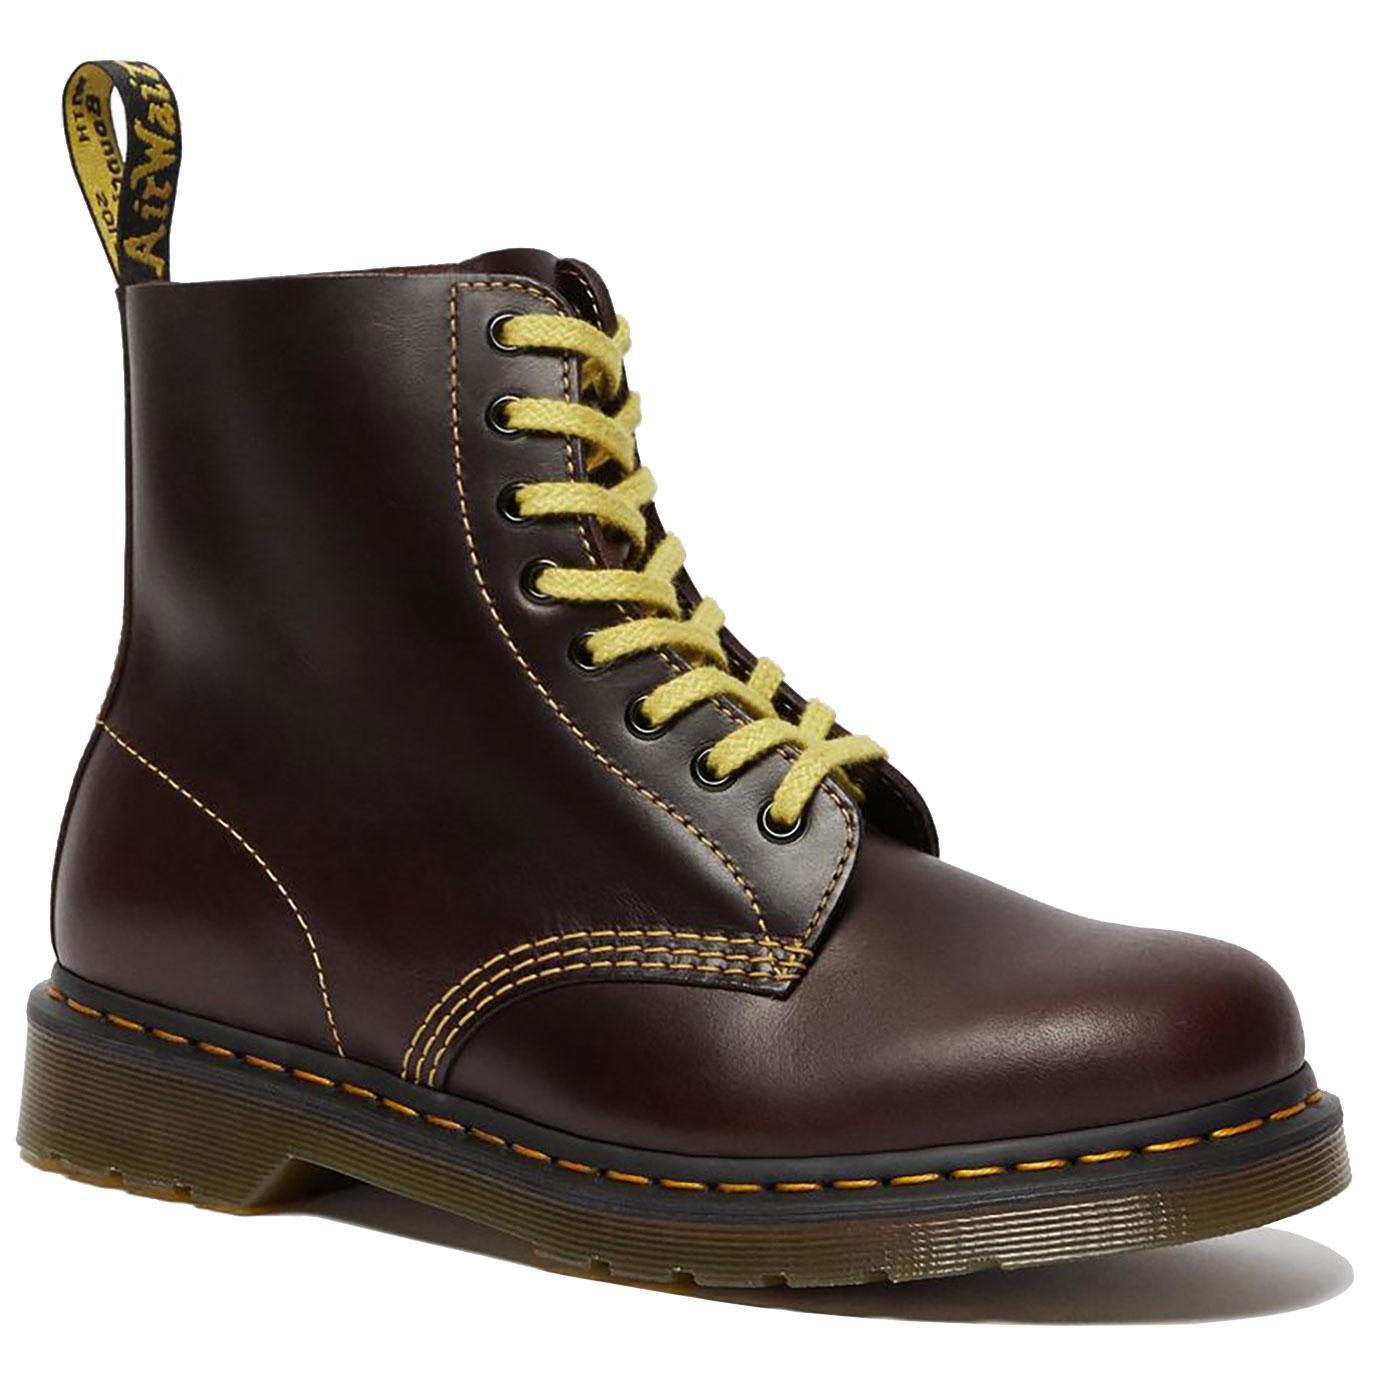 1460 Pascal DR MARTENS Mod Contrast Stitch Boots O